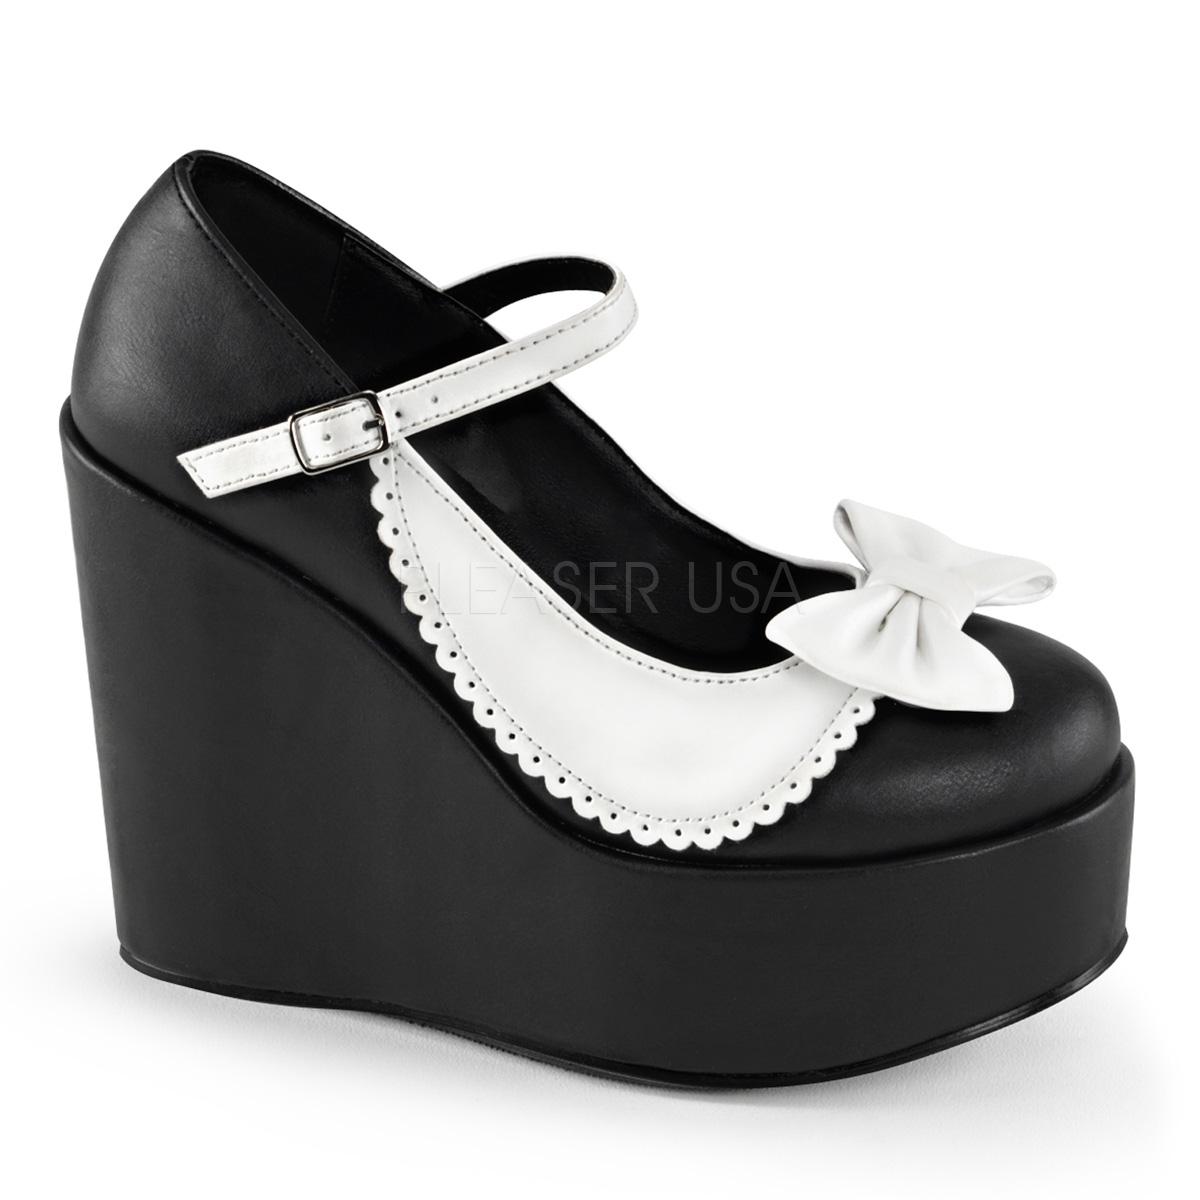 Chaussure compense a talon